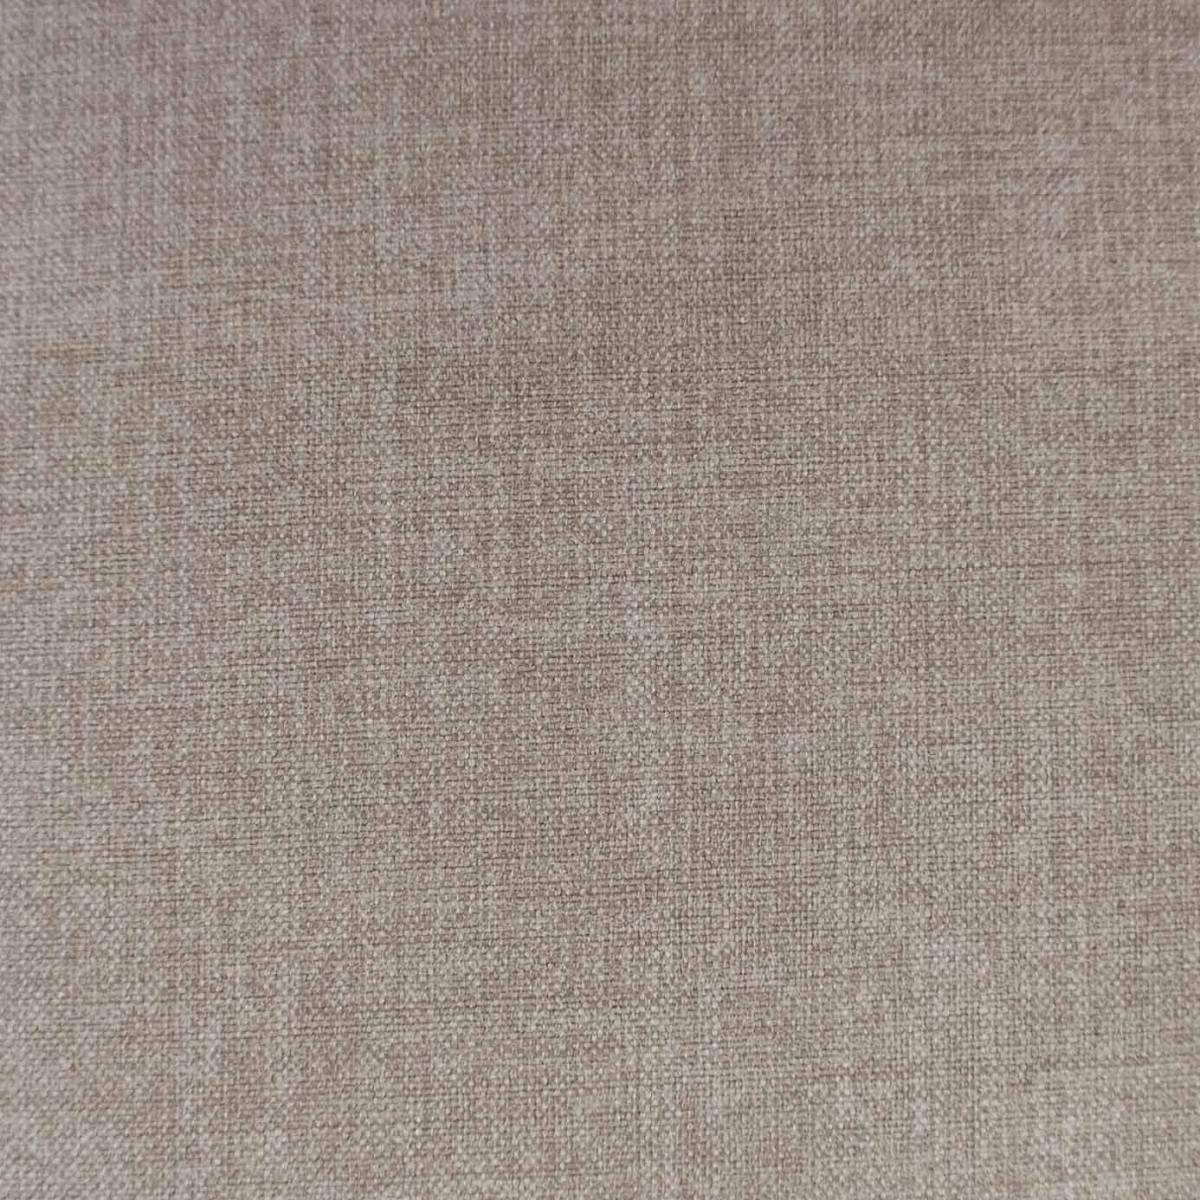 Moda Christmas Fabric 2019.Roman Blinds In Cristina Marrone Moda Fabric Nutmeg Product Code Mod2225